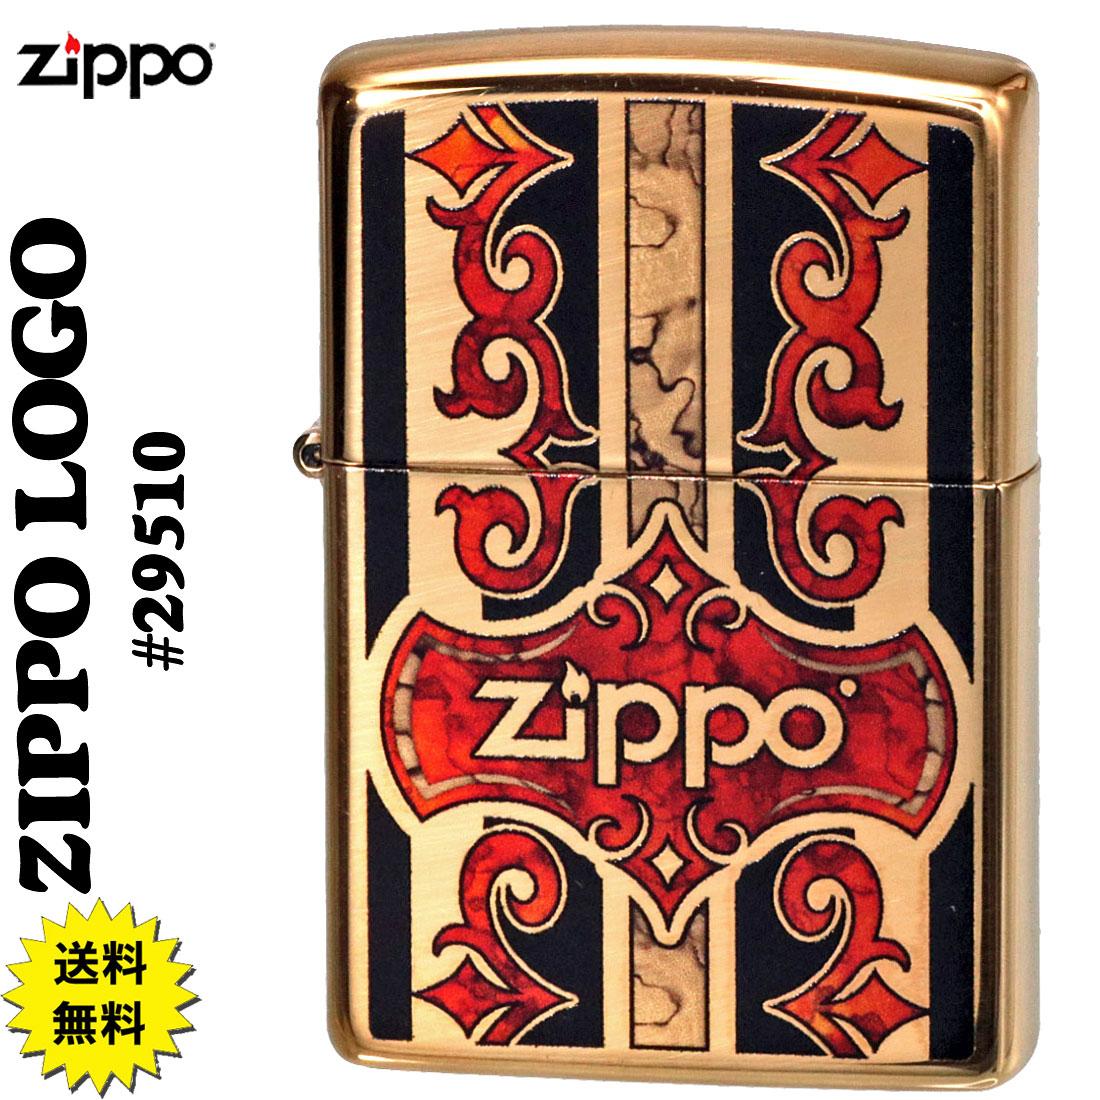 ZIPPO(ジッポーライター) ZIPPO LOGO #29510 ハイポリッシュブラス画像